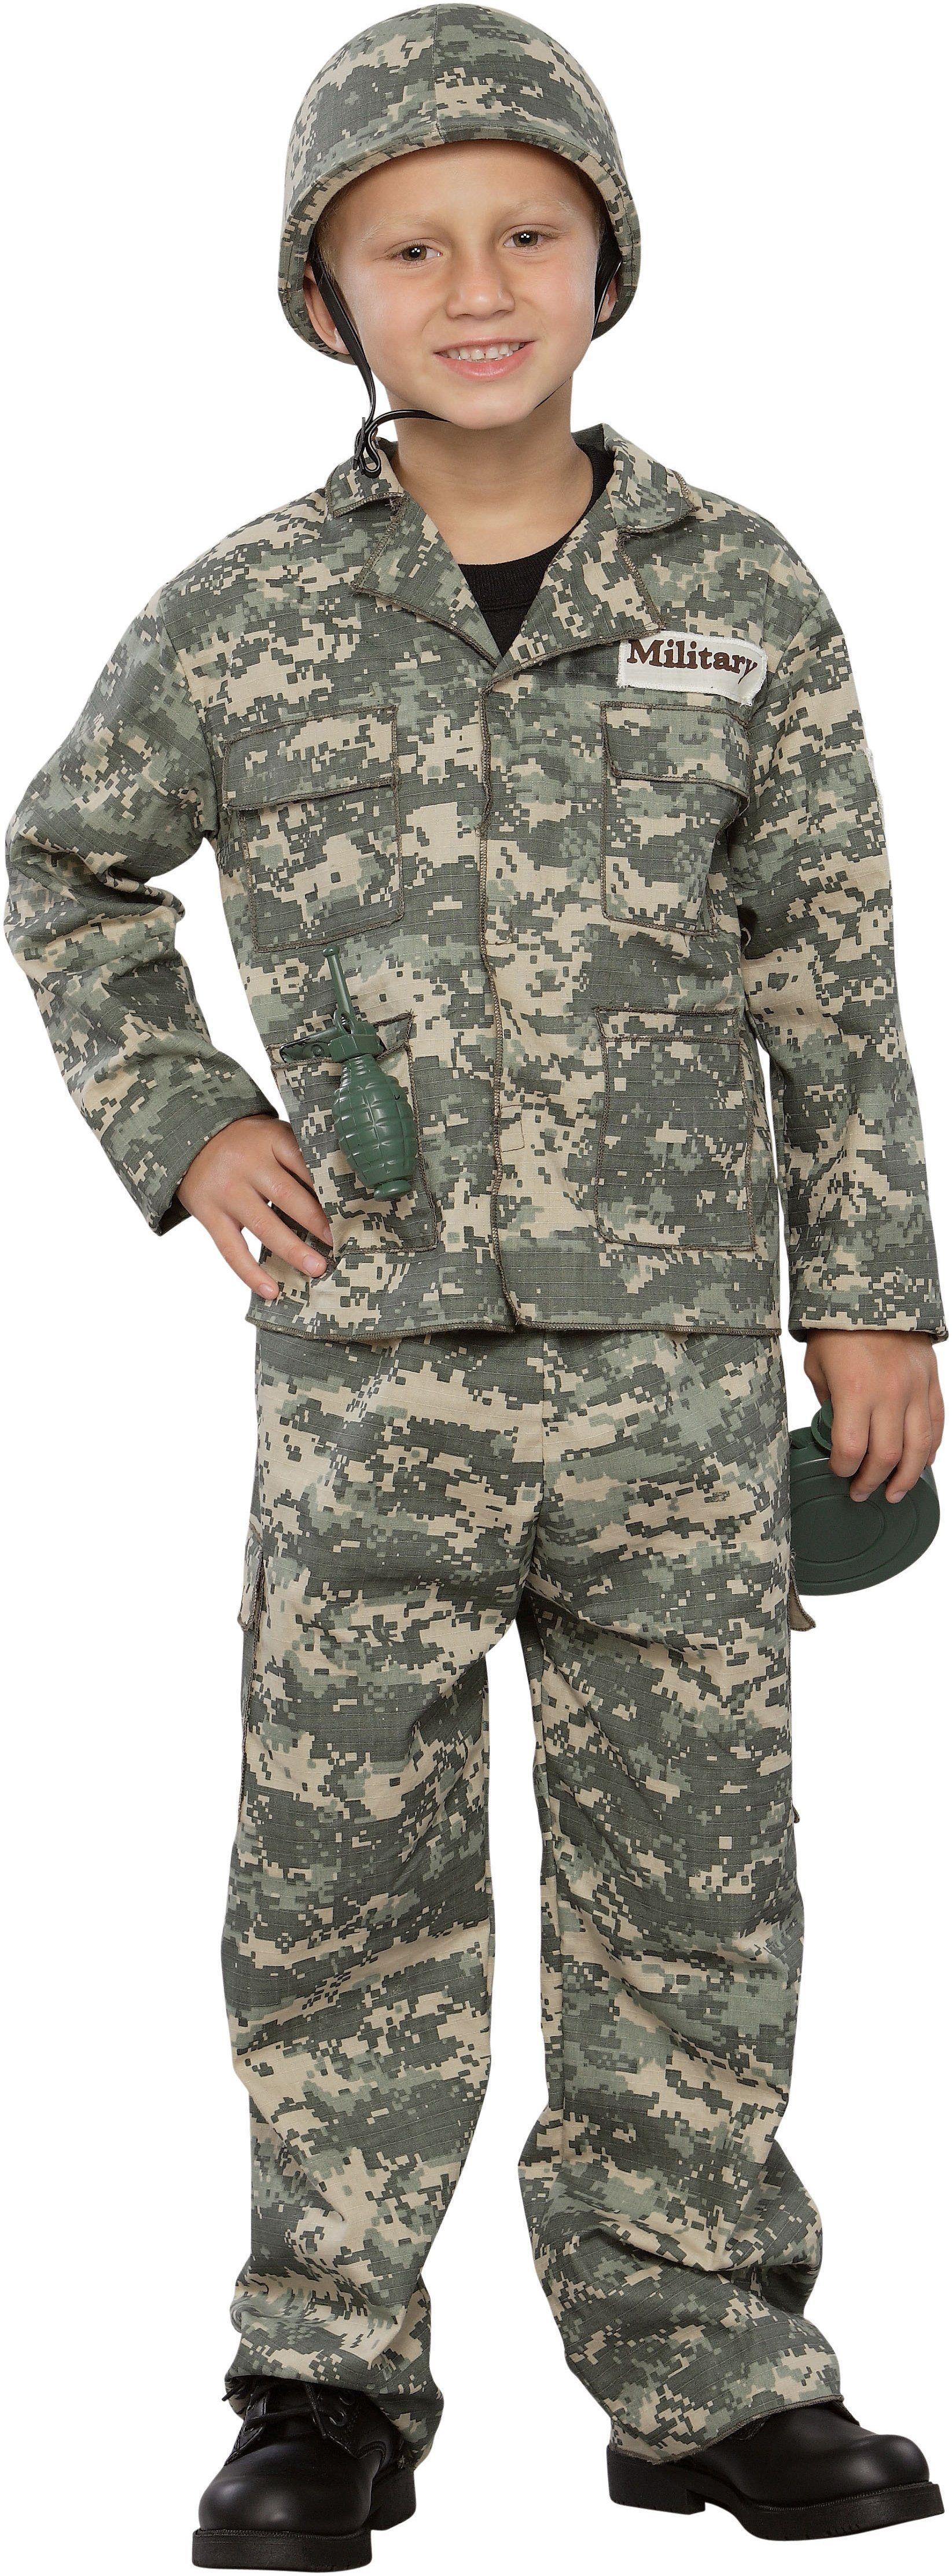 Army Soldier Child Costume  sc 1 st  Pinterest & Army Soldier Child Costume   Daughters Costumes and Soldiers